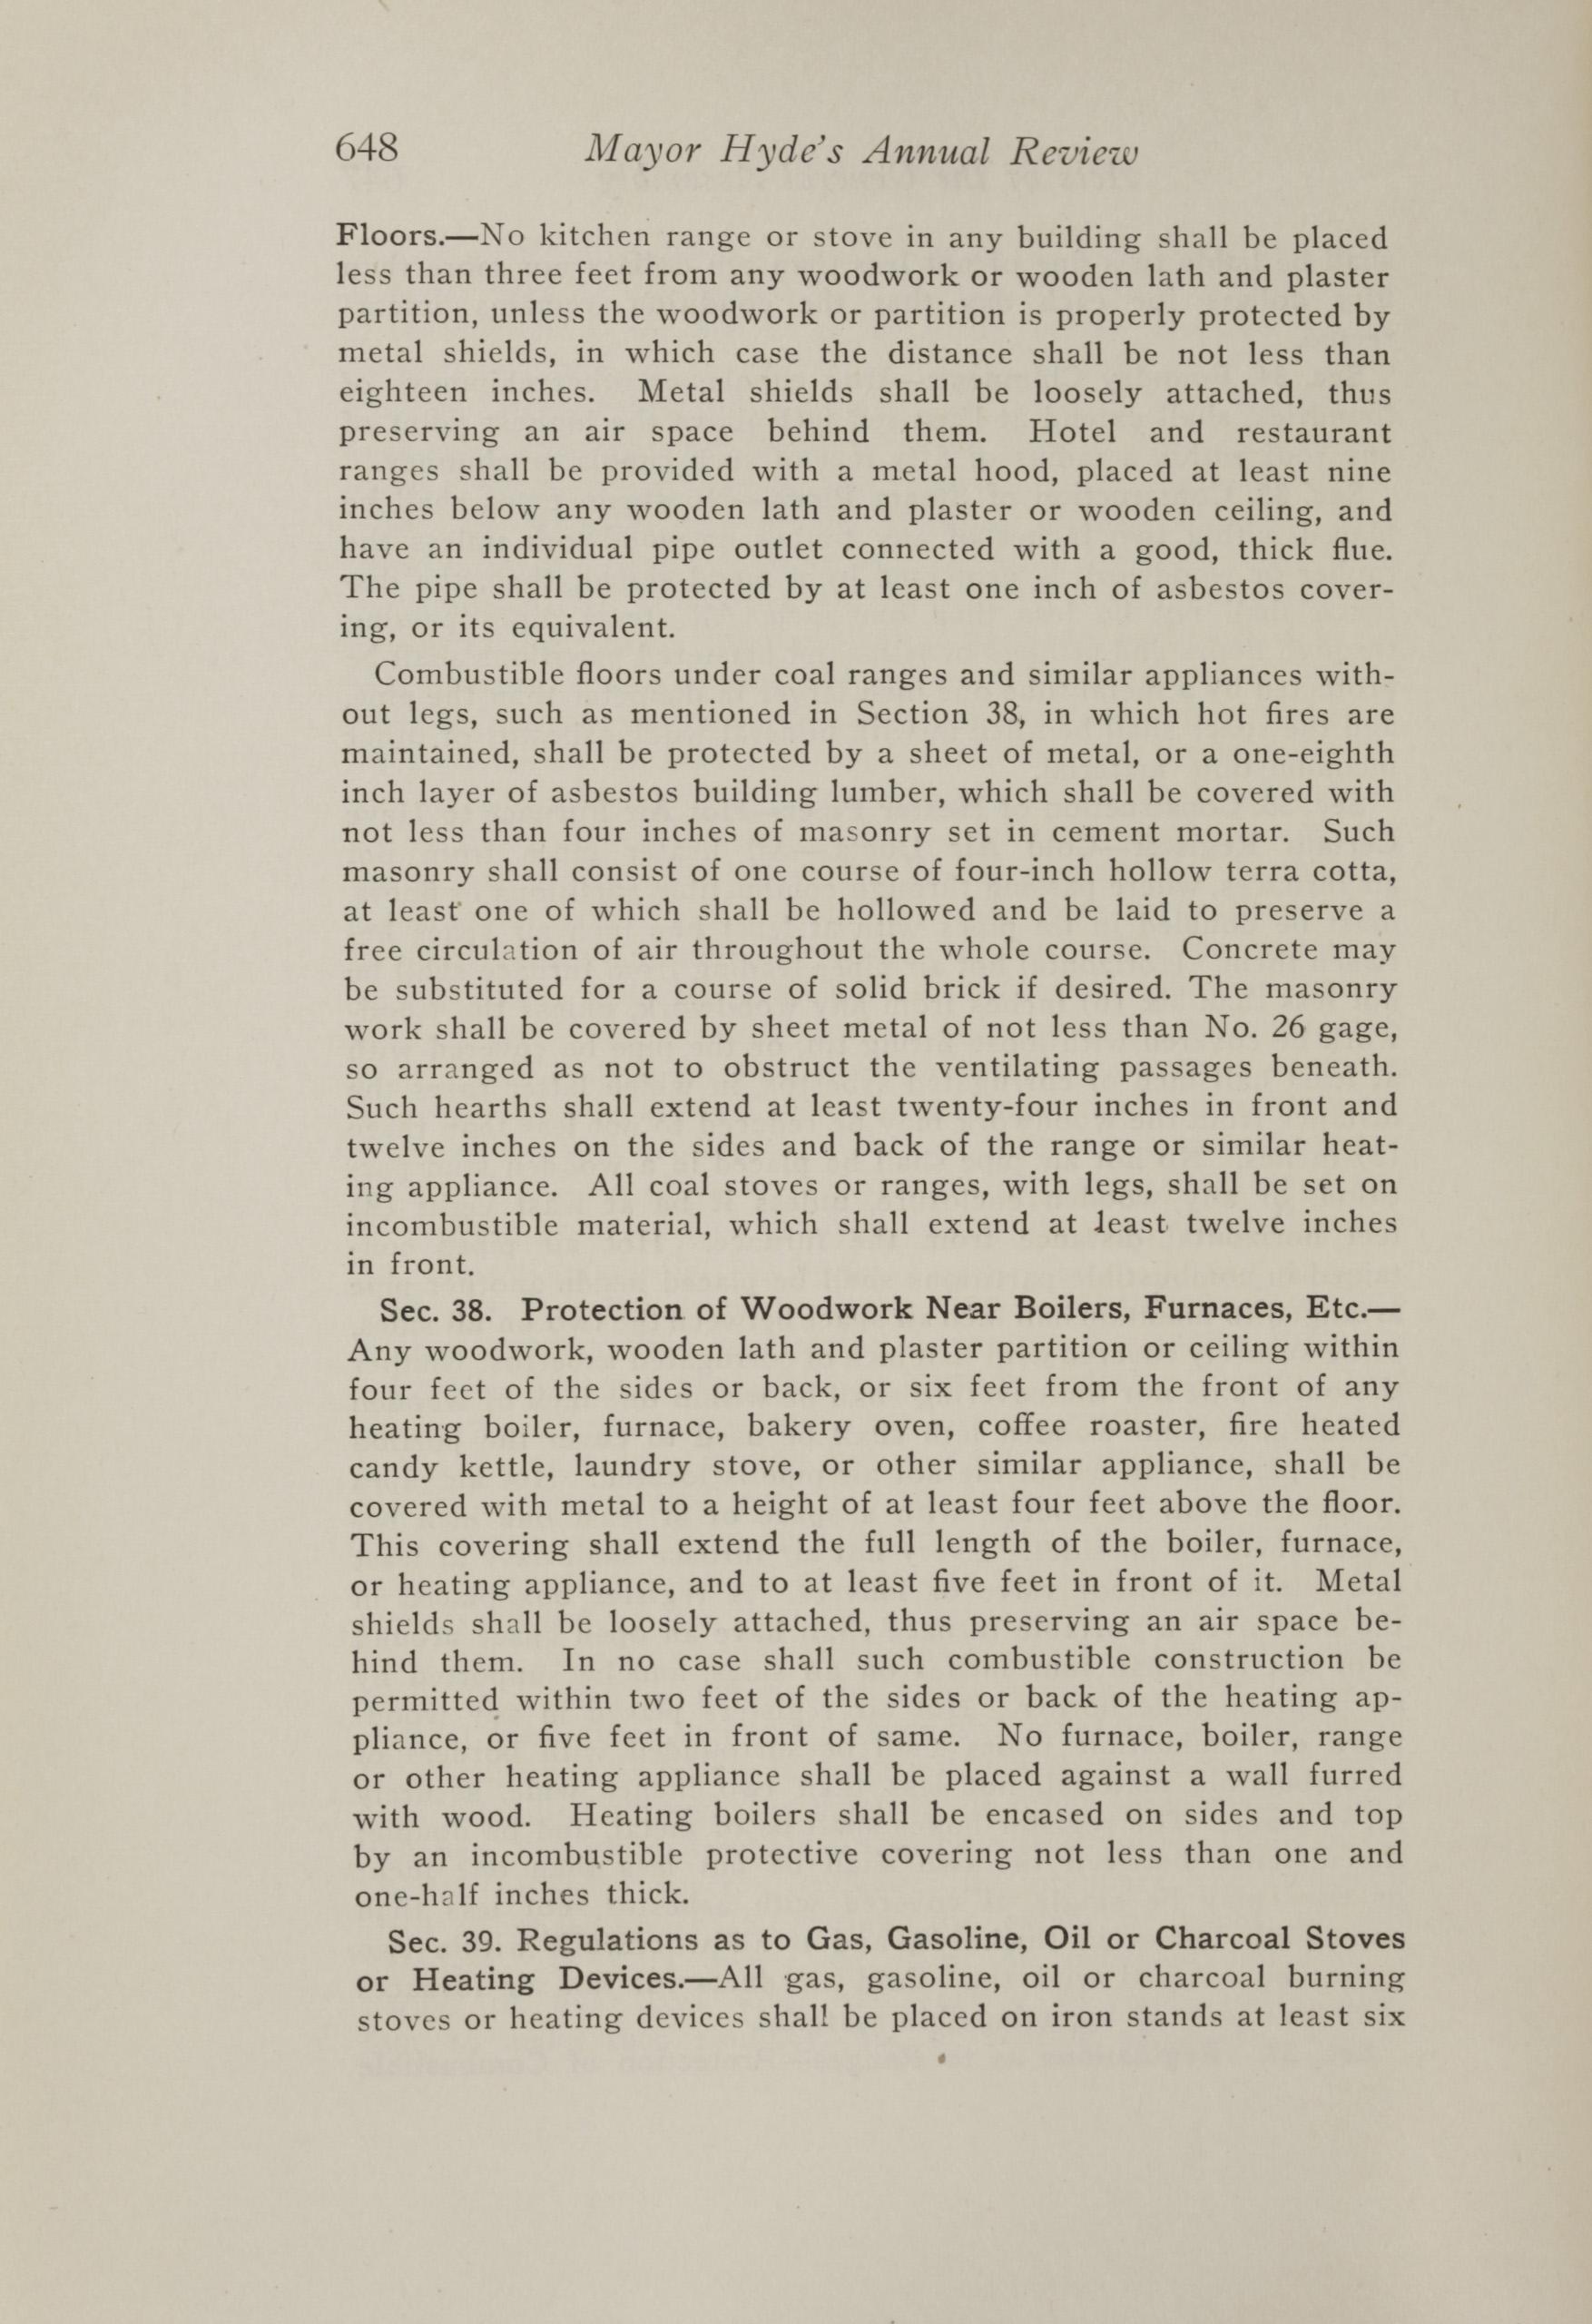 Charleston Yearbook, 1917, page 648